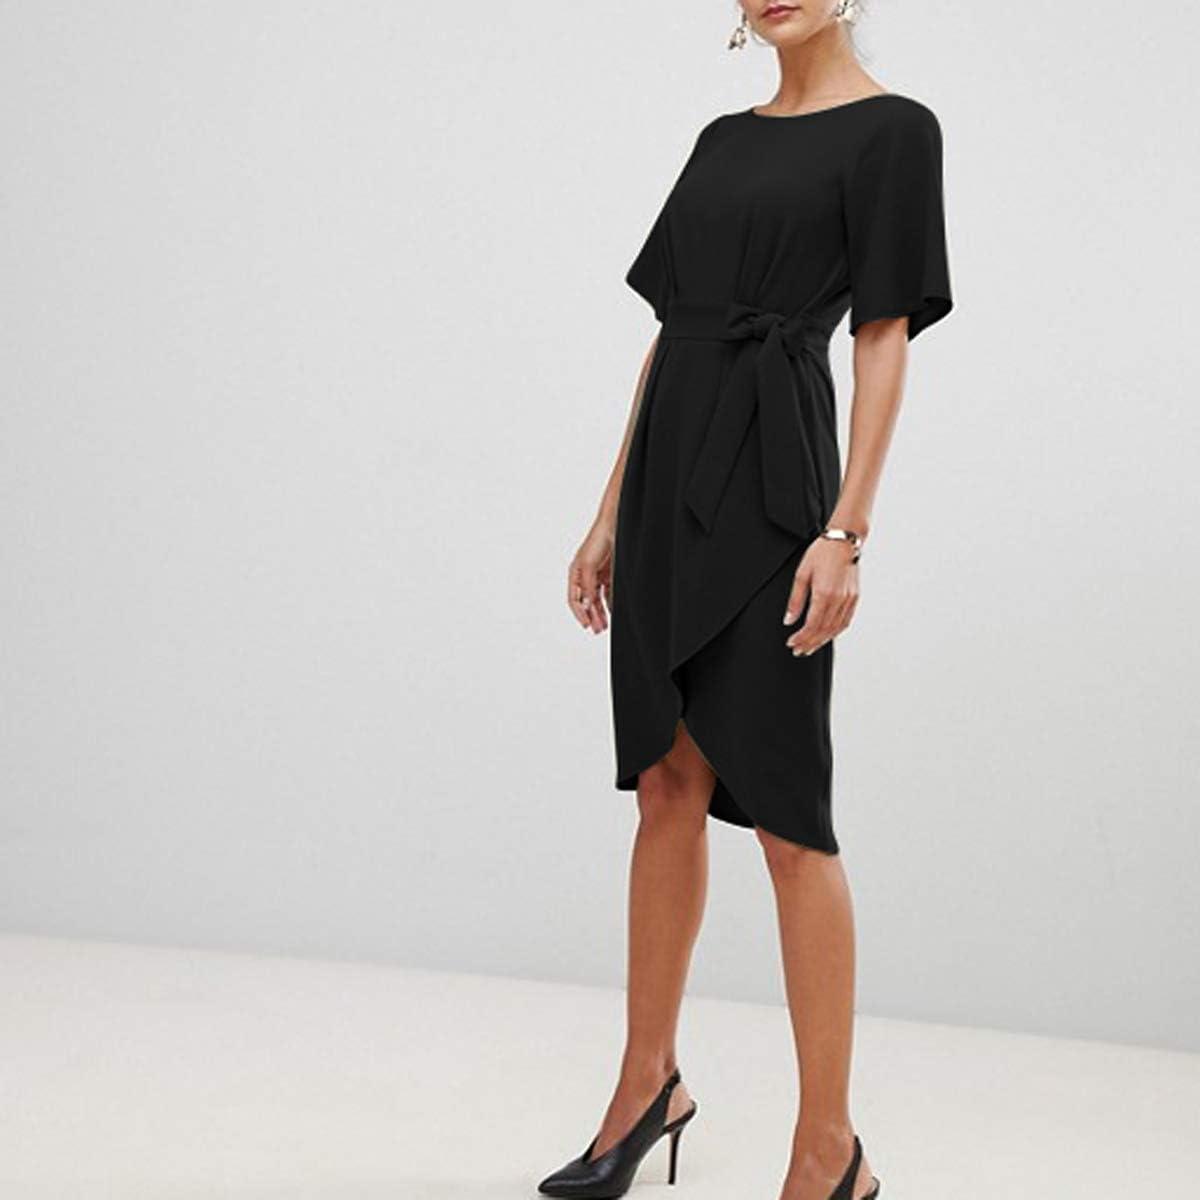 Women Short Sleeve Split Belted Midi Dress Office Business Party Cocktail Dress